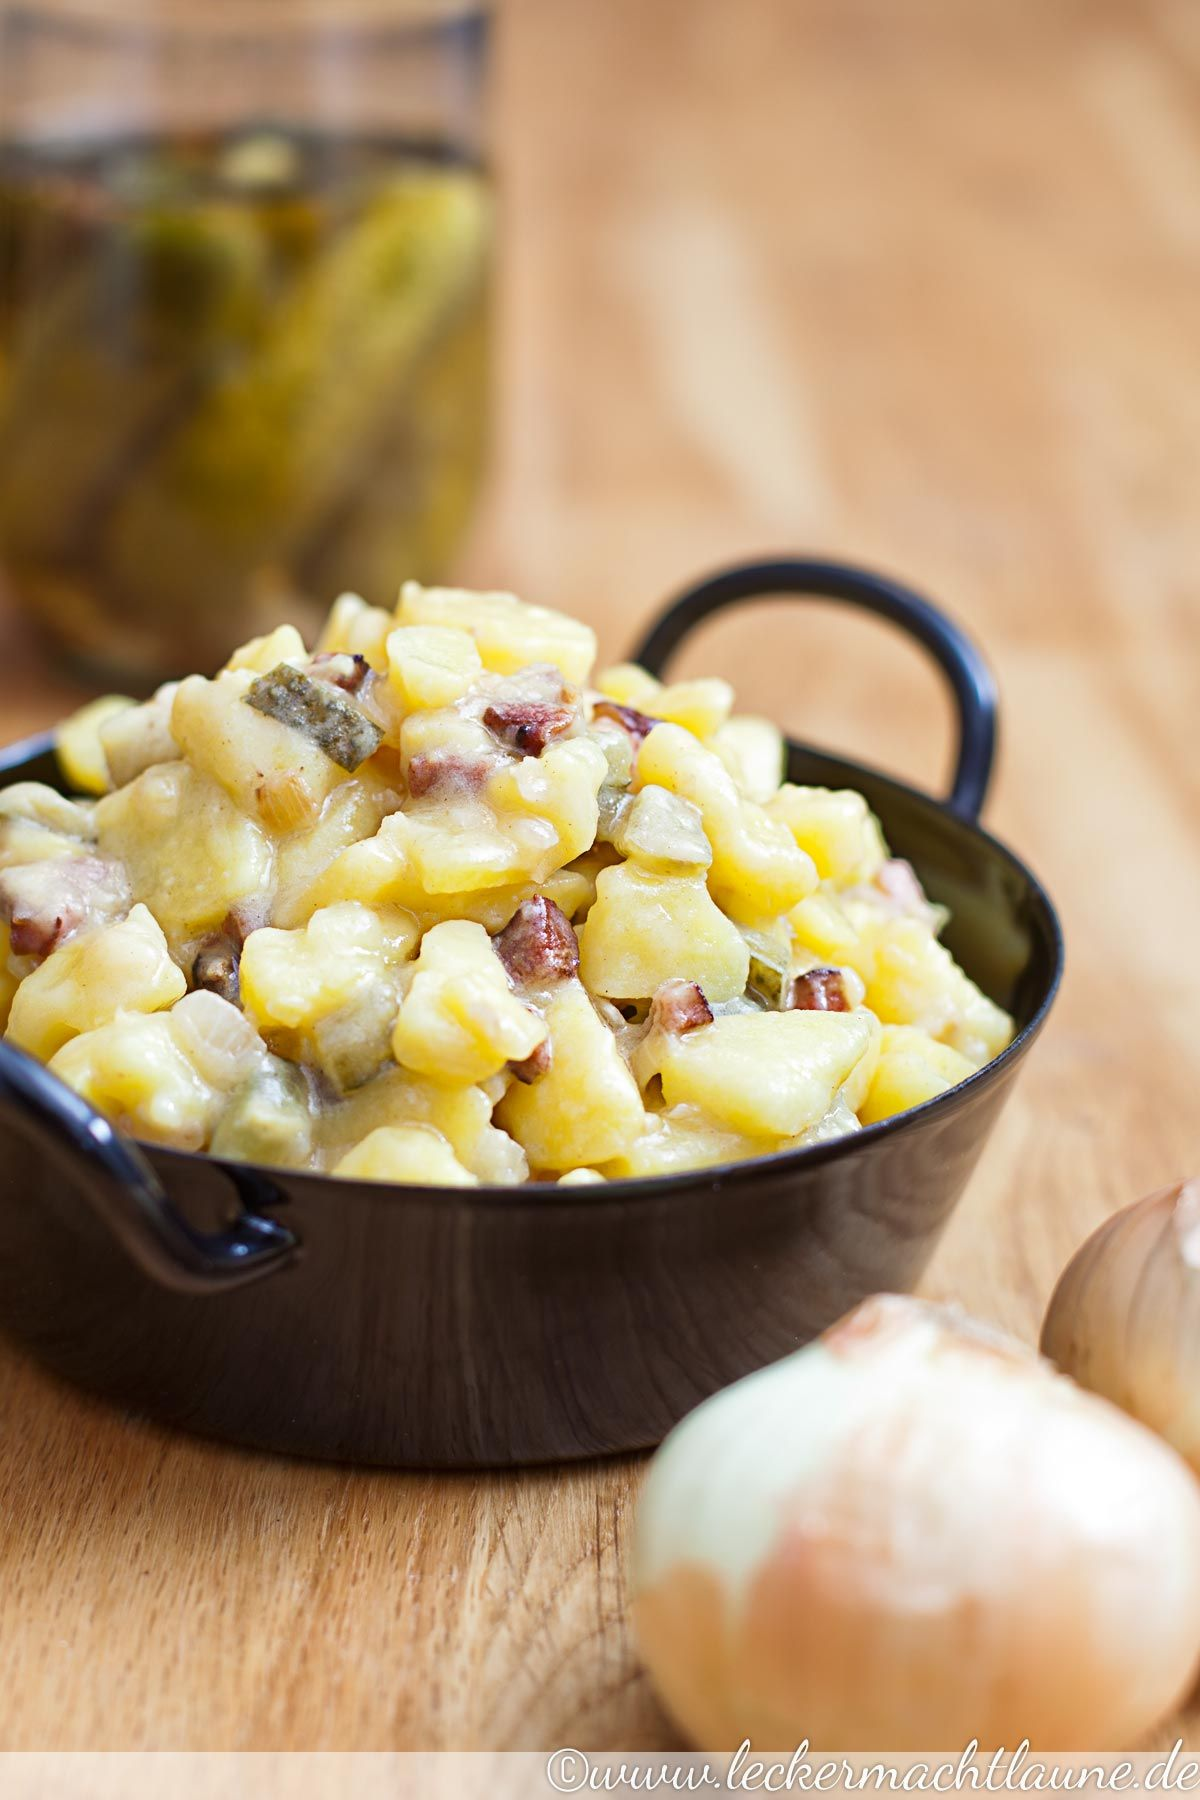 kartoffelsalat ohne mayo grundrezept salat pinterest kartoffelsalat ohne mayo. Black Bedroom Furniture Sets. Home Design Ideas